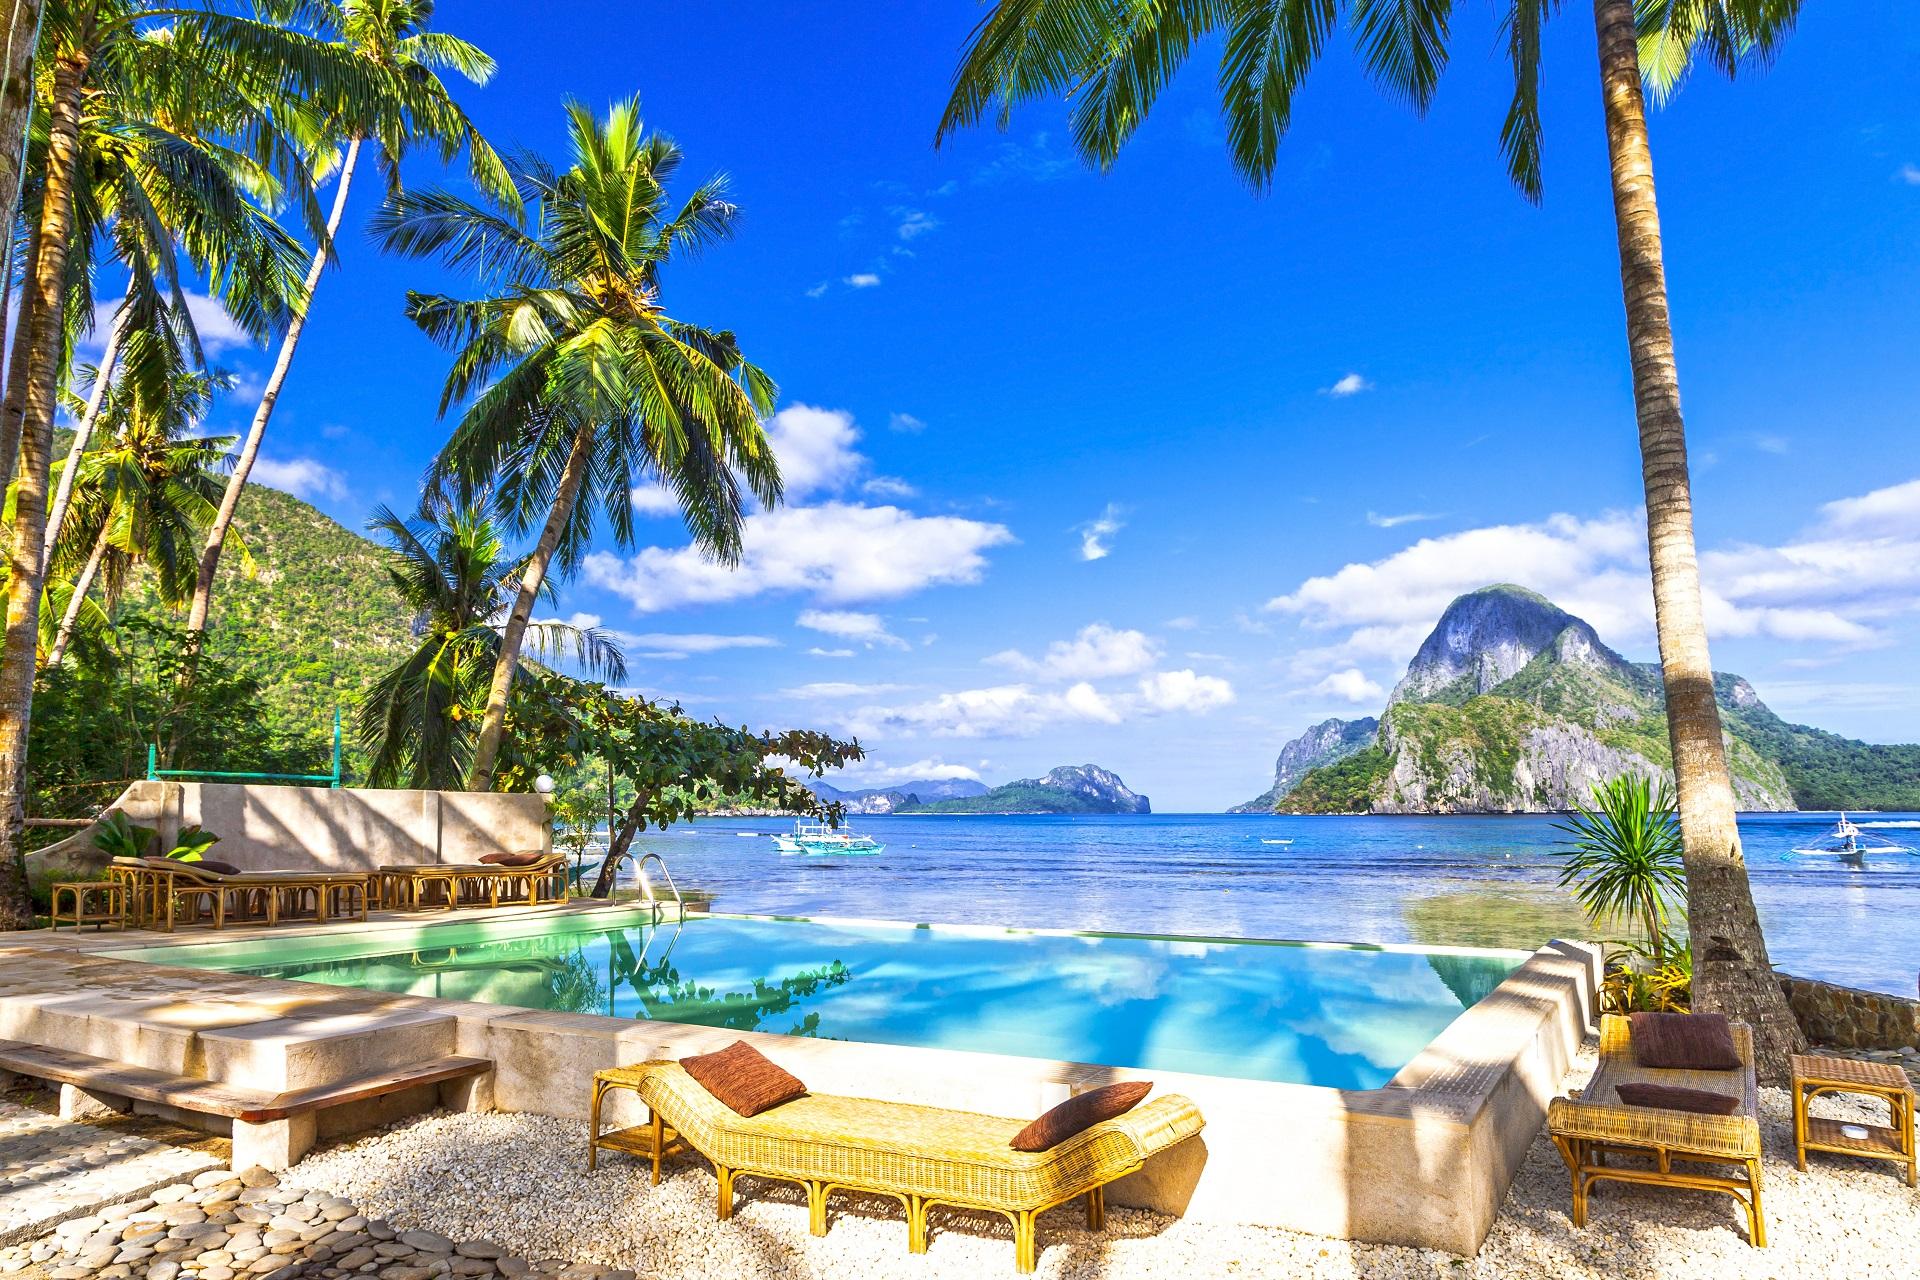 El Nido_Philippinen_pool resort shutterstock_345857036